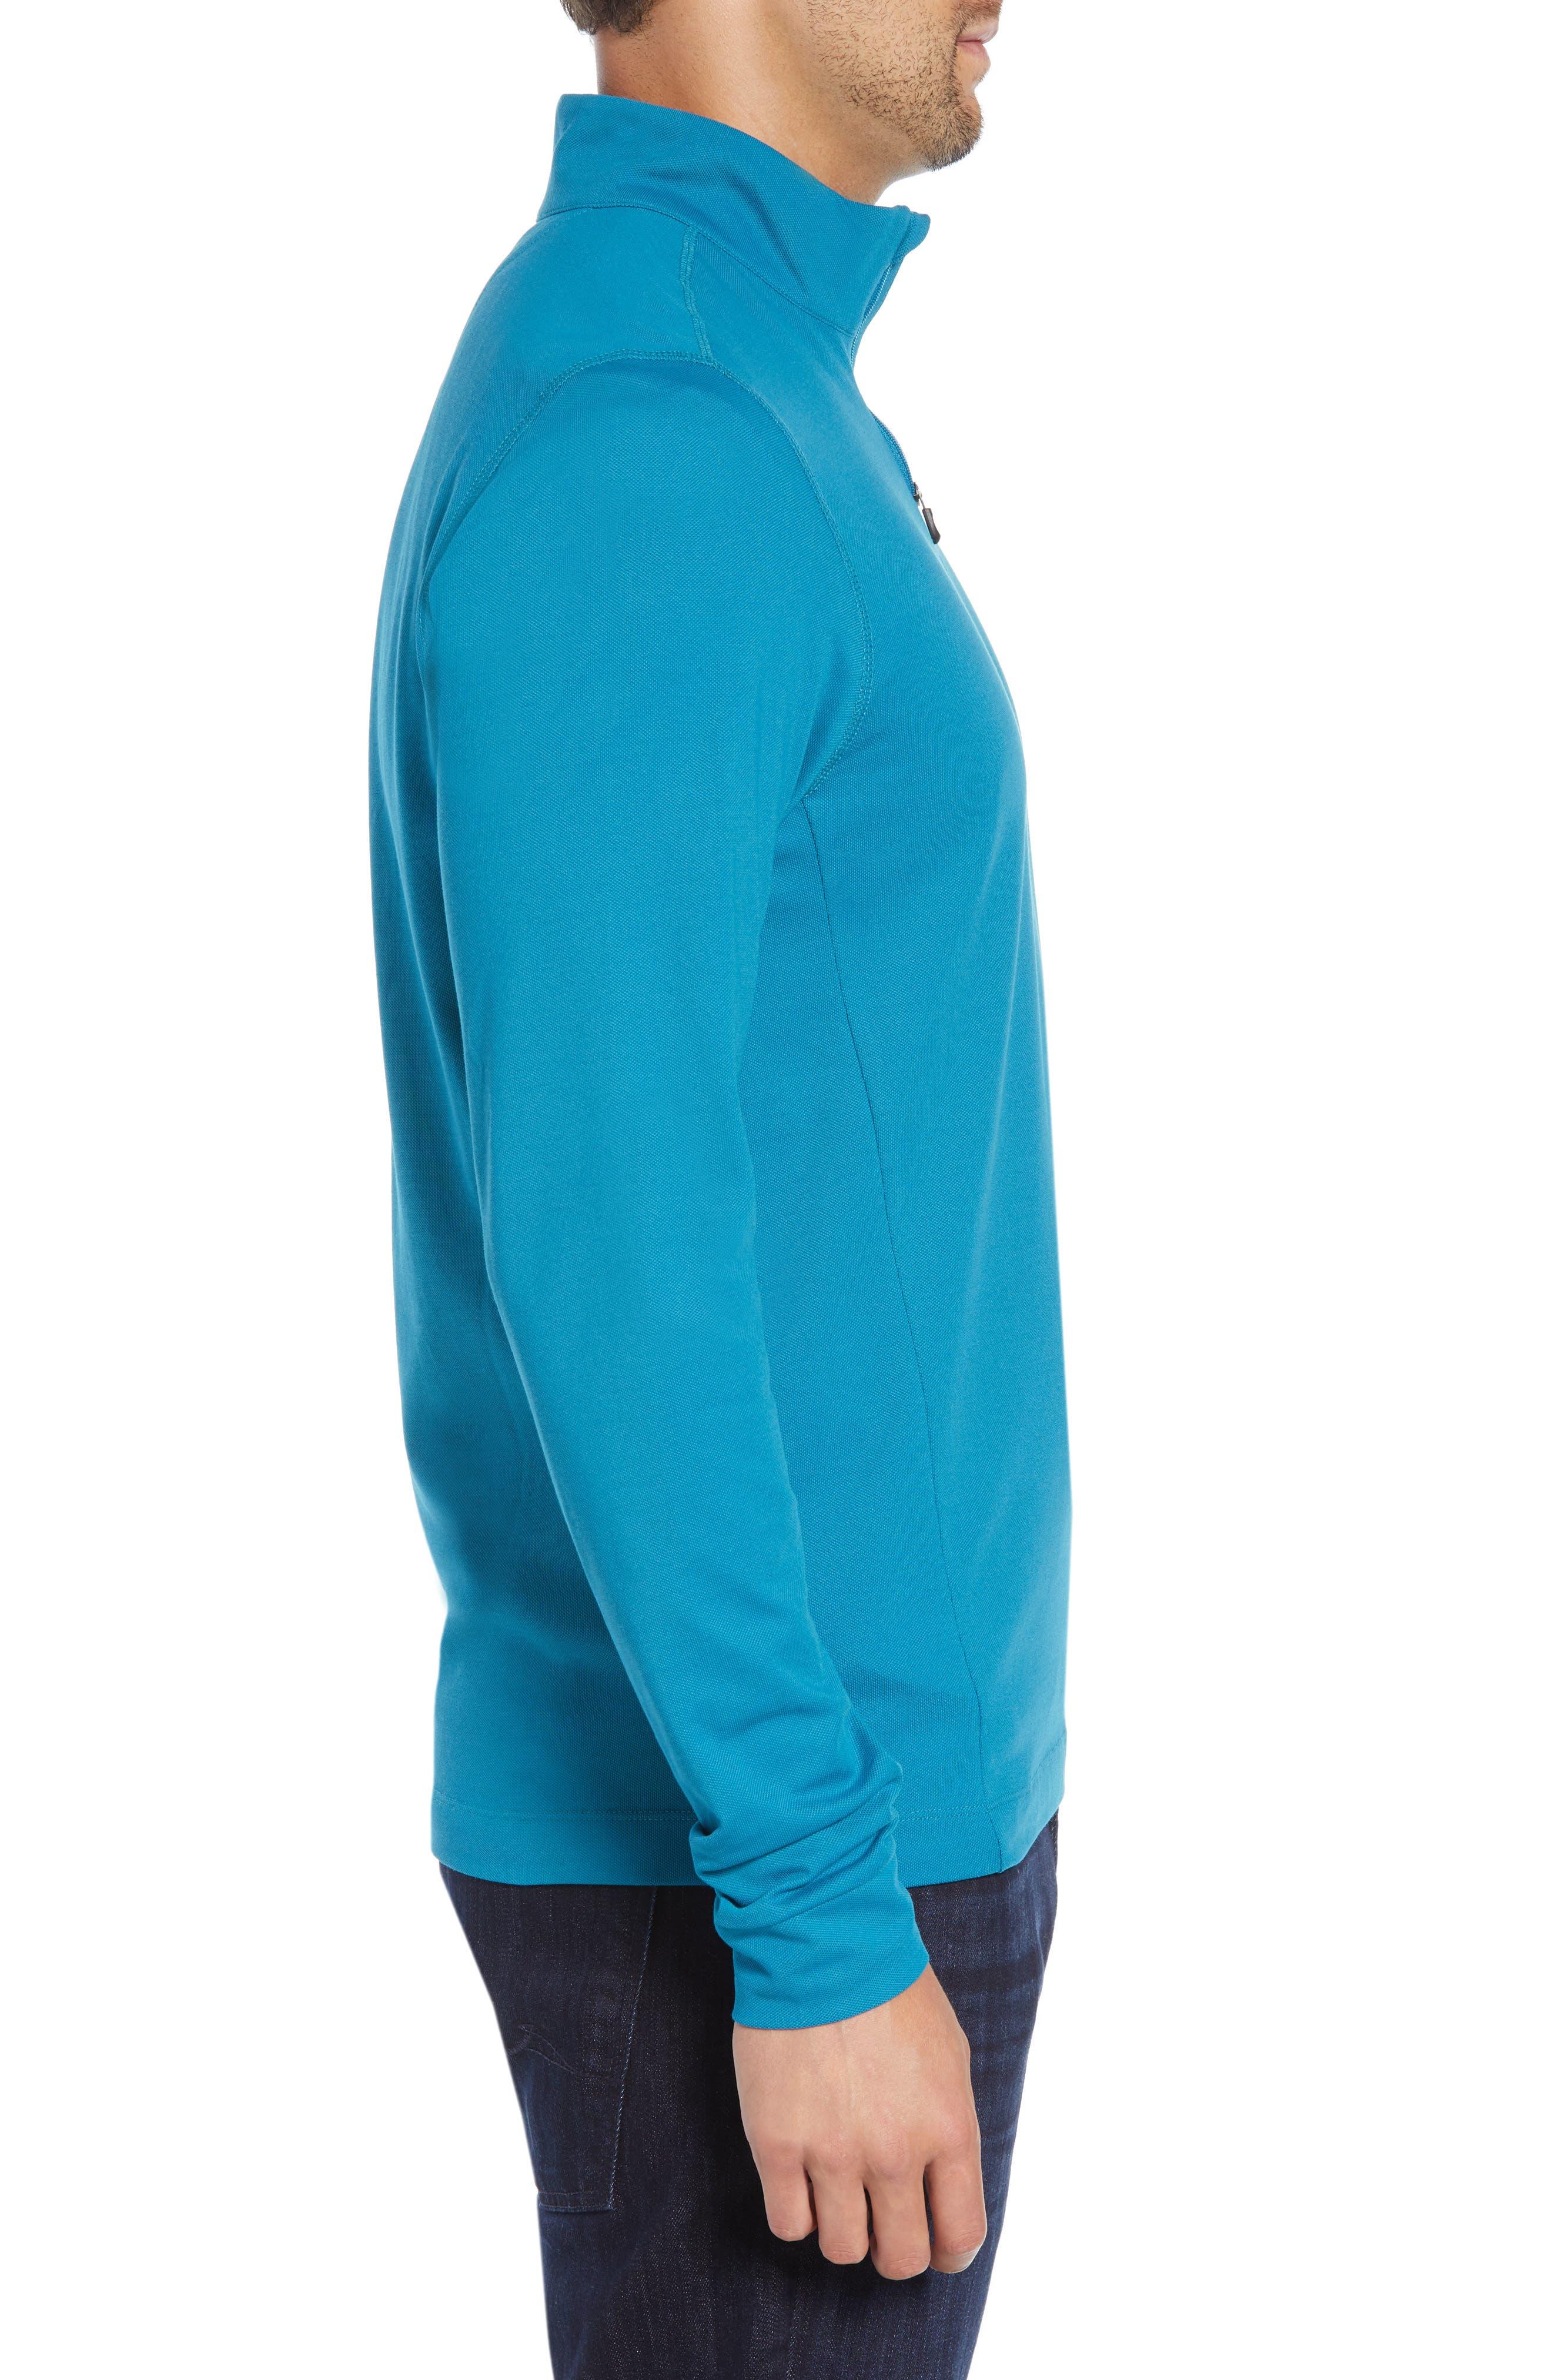 CUTTER & BUCK, Advantage Regular Fit DryTec Mock Neck Pullover, Alternate thumbnail 3, color, TEAL BLUE